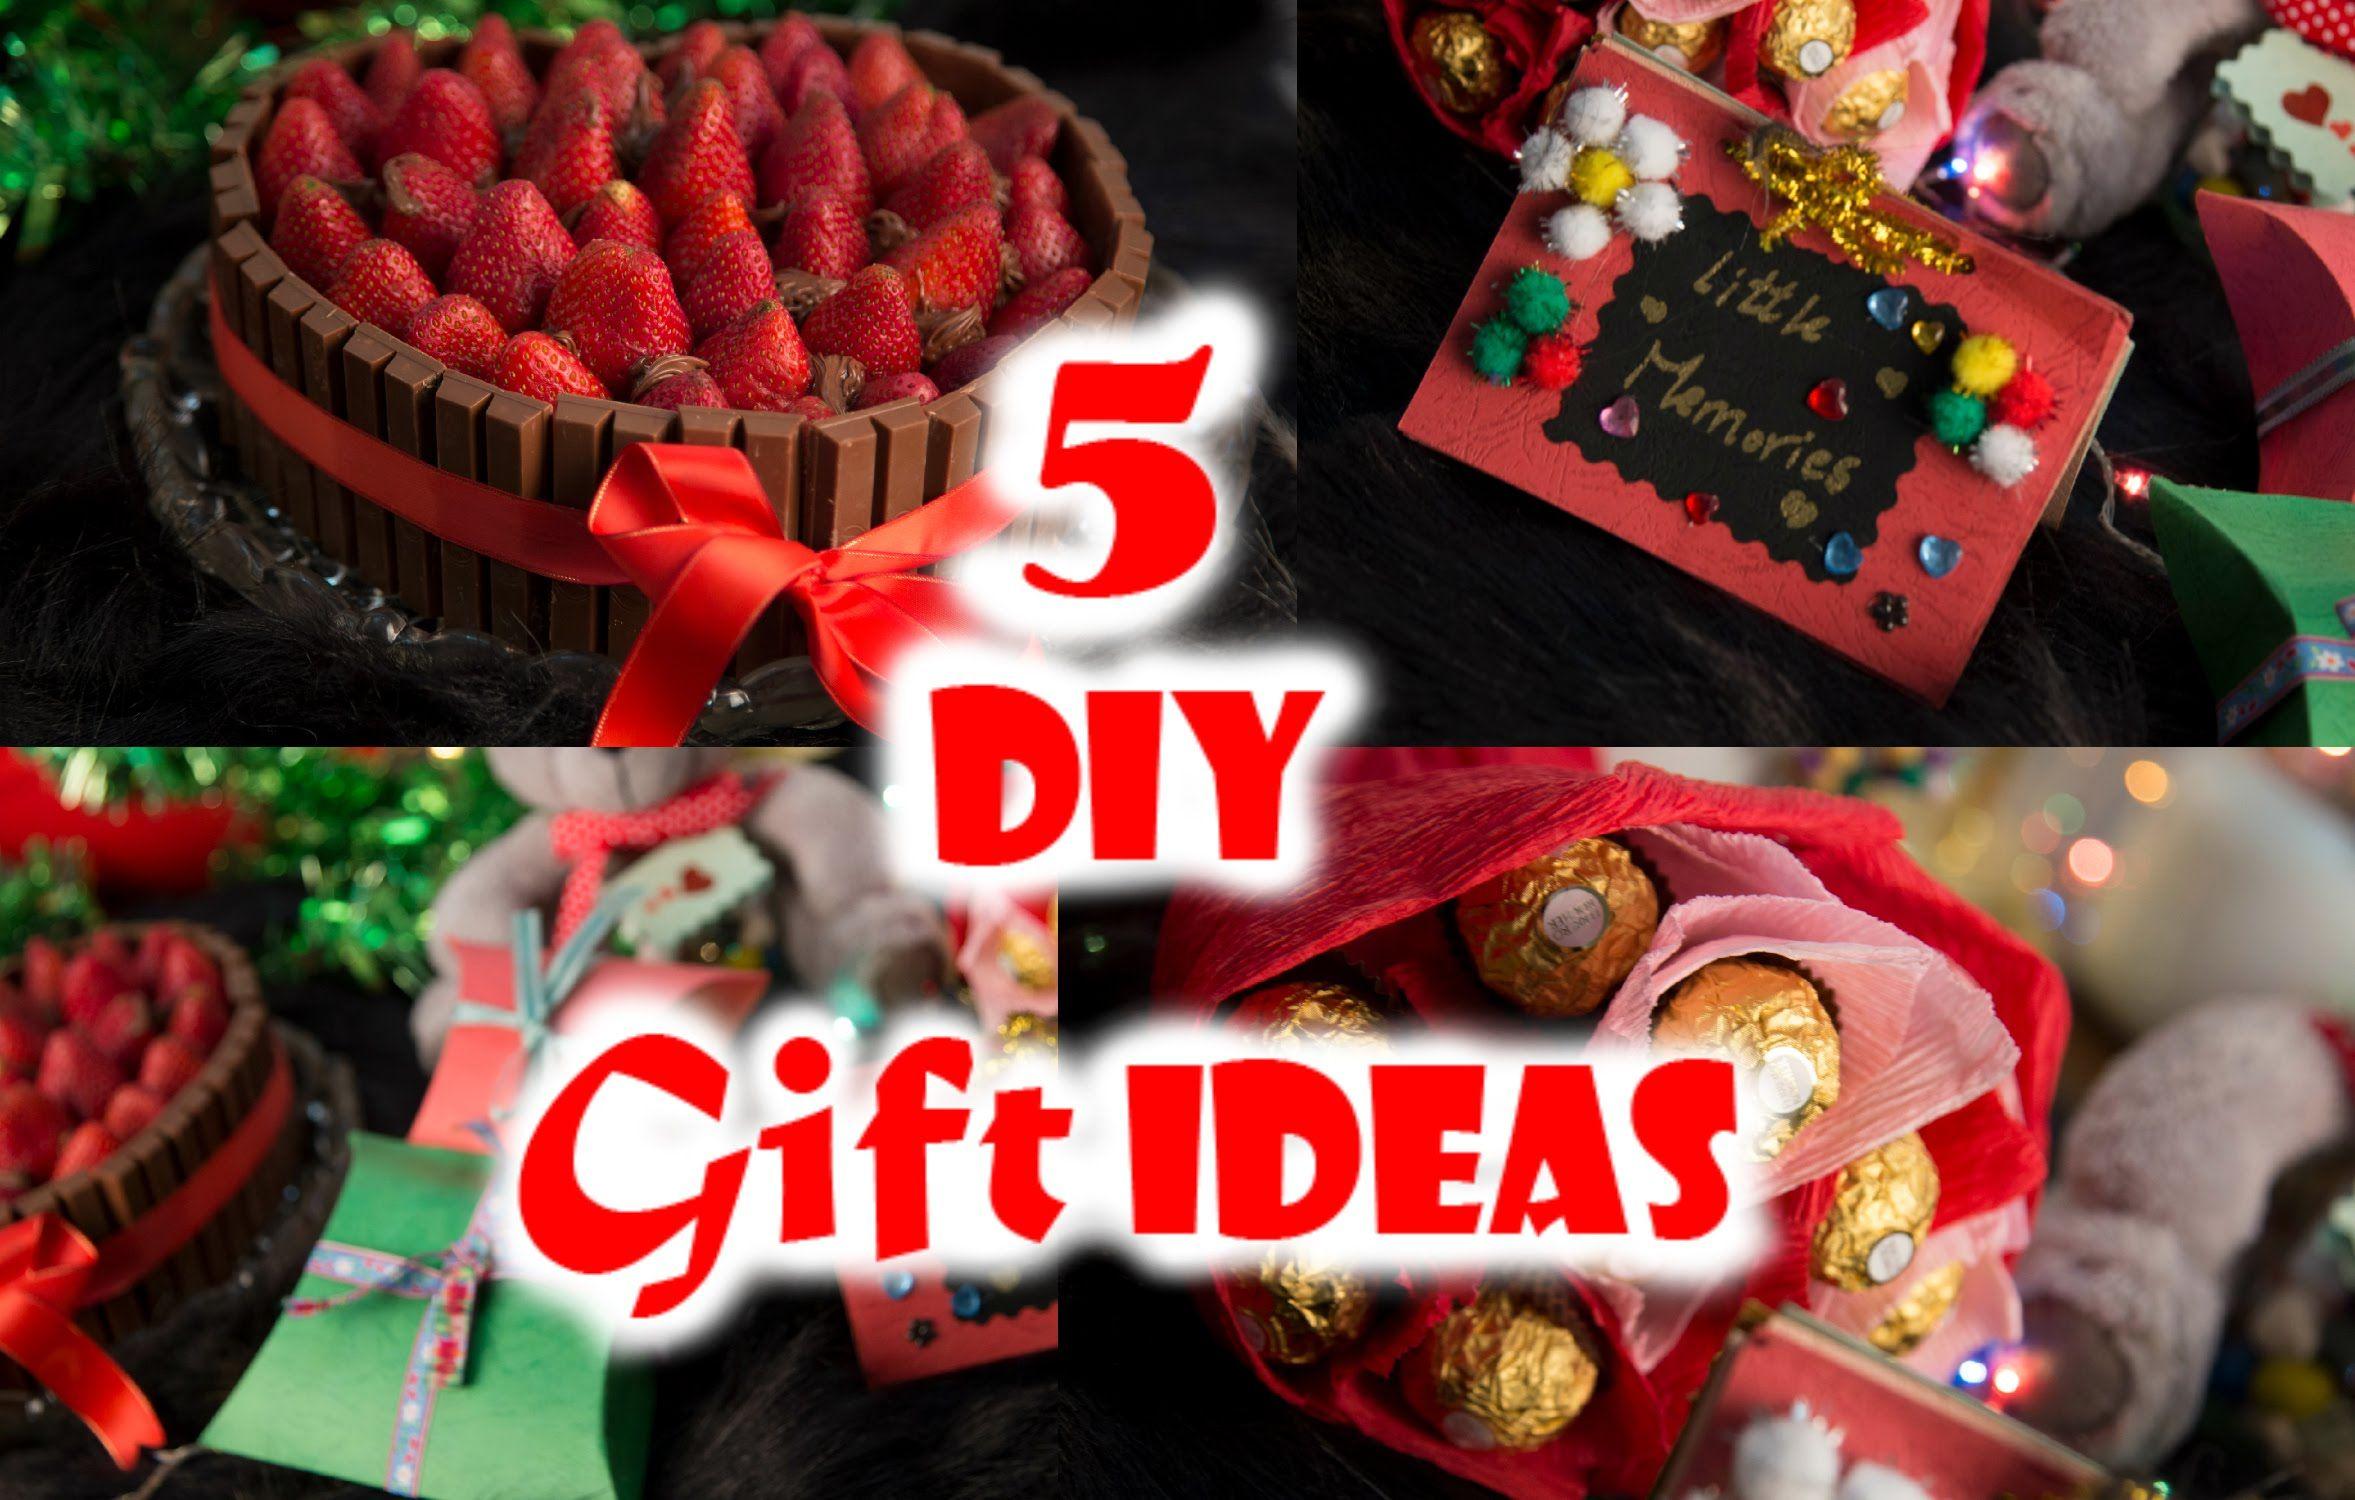 5 Diy Gift Ideas خمس افكار سهلة و بسيطة لصنع هدية لمن تحب Diy Gift Gifts Projects To Try